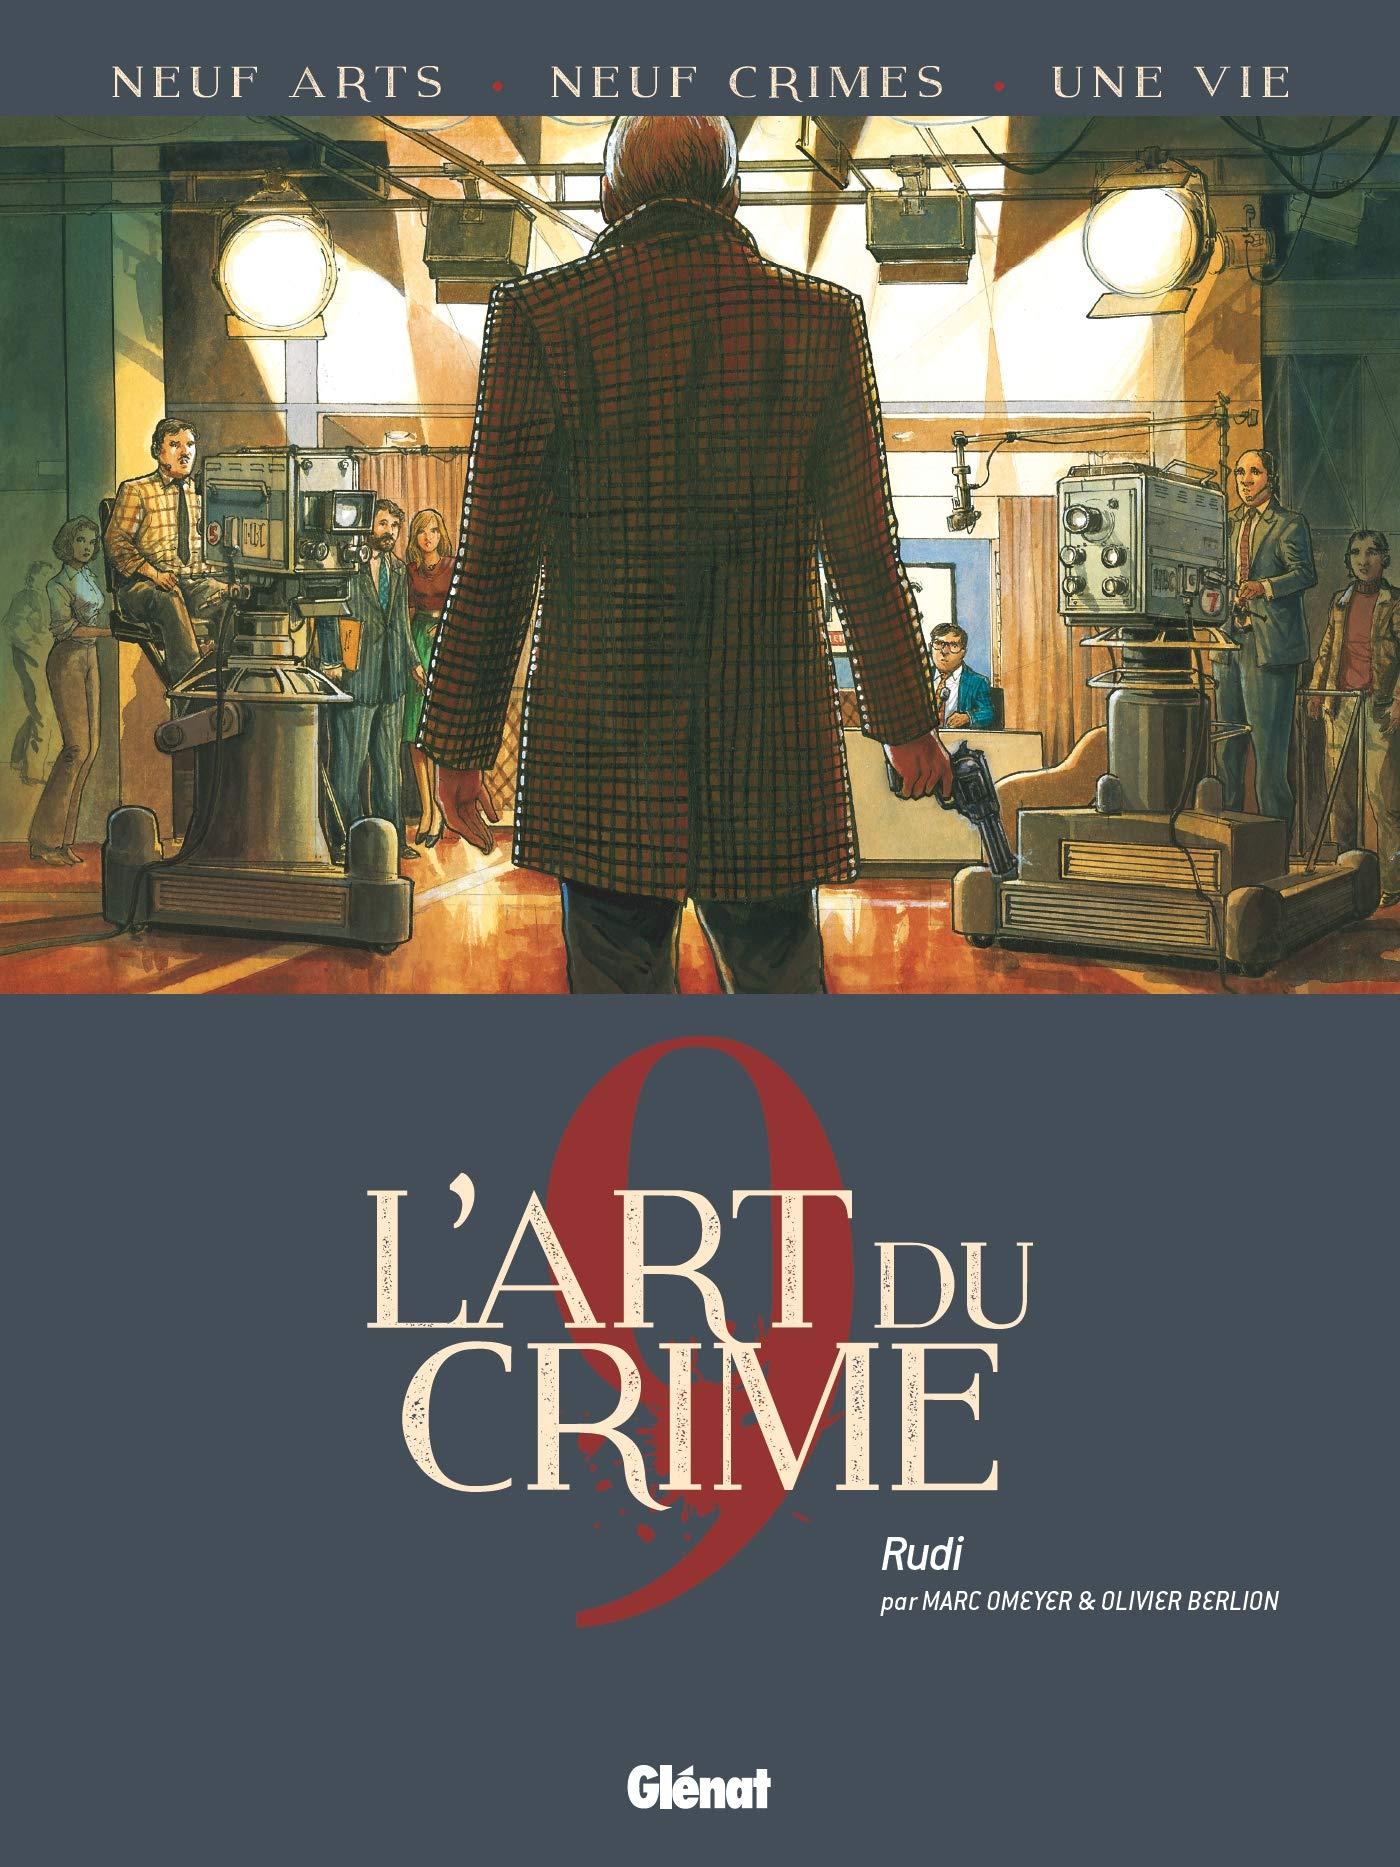 L'art du crime 9 - Rudi